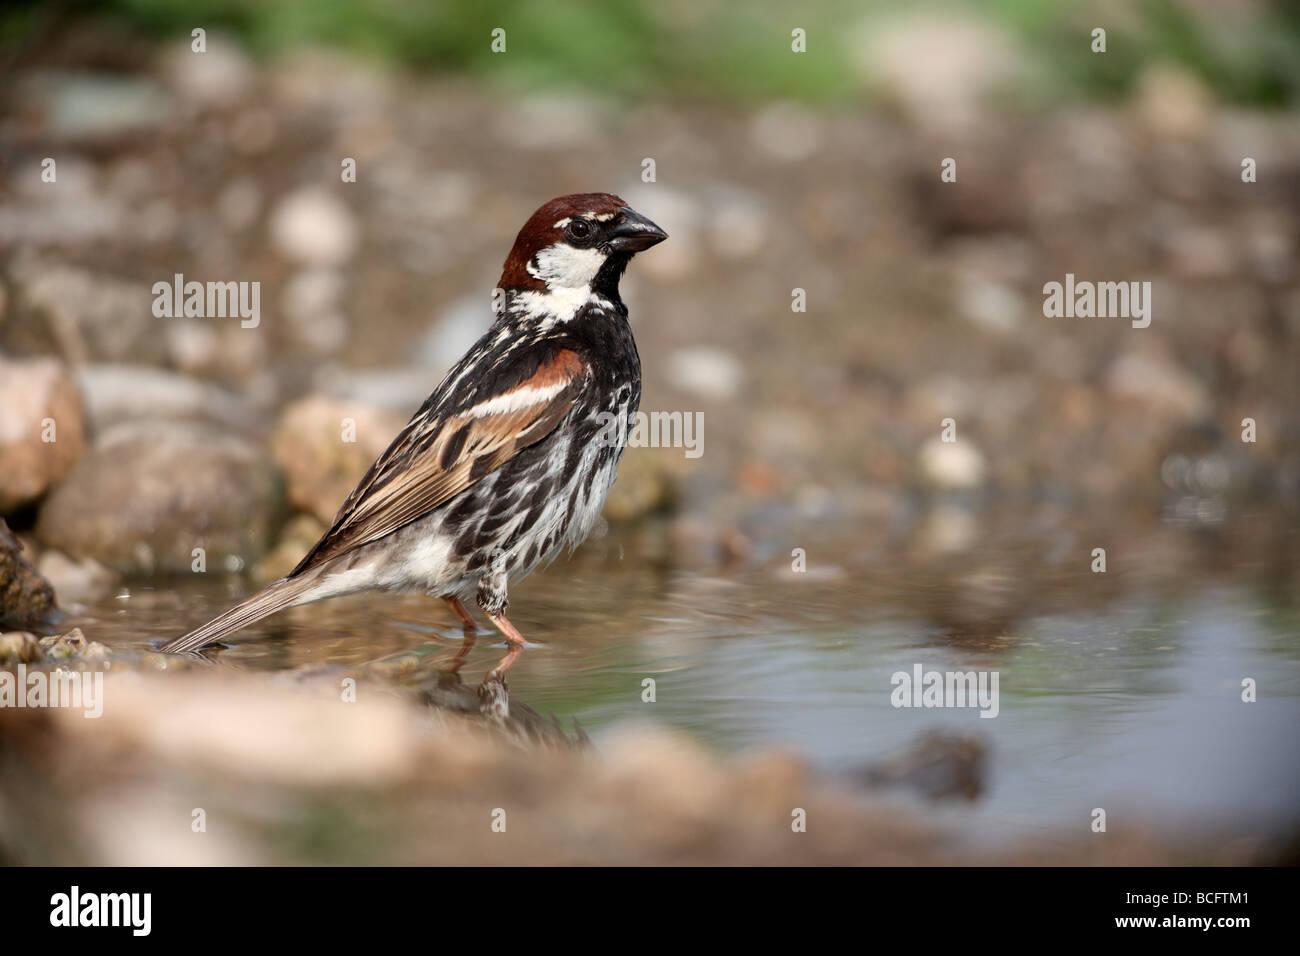 Spanish sparrow Passer hispaniolensis male Bulgaria June 2009 Stock Photo